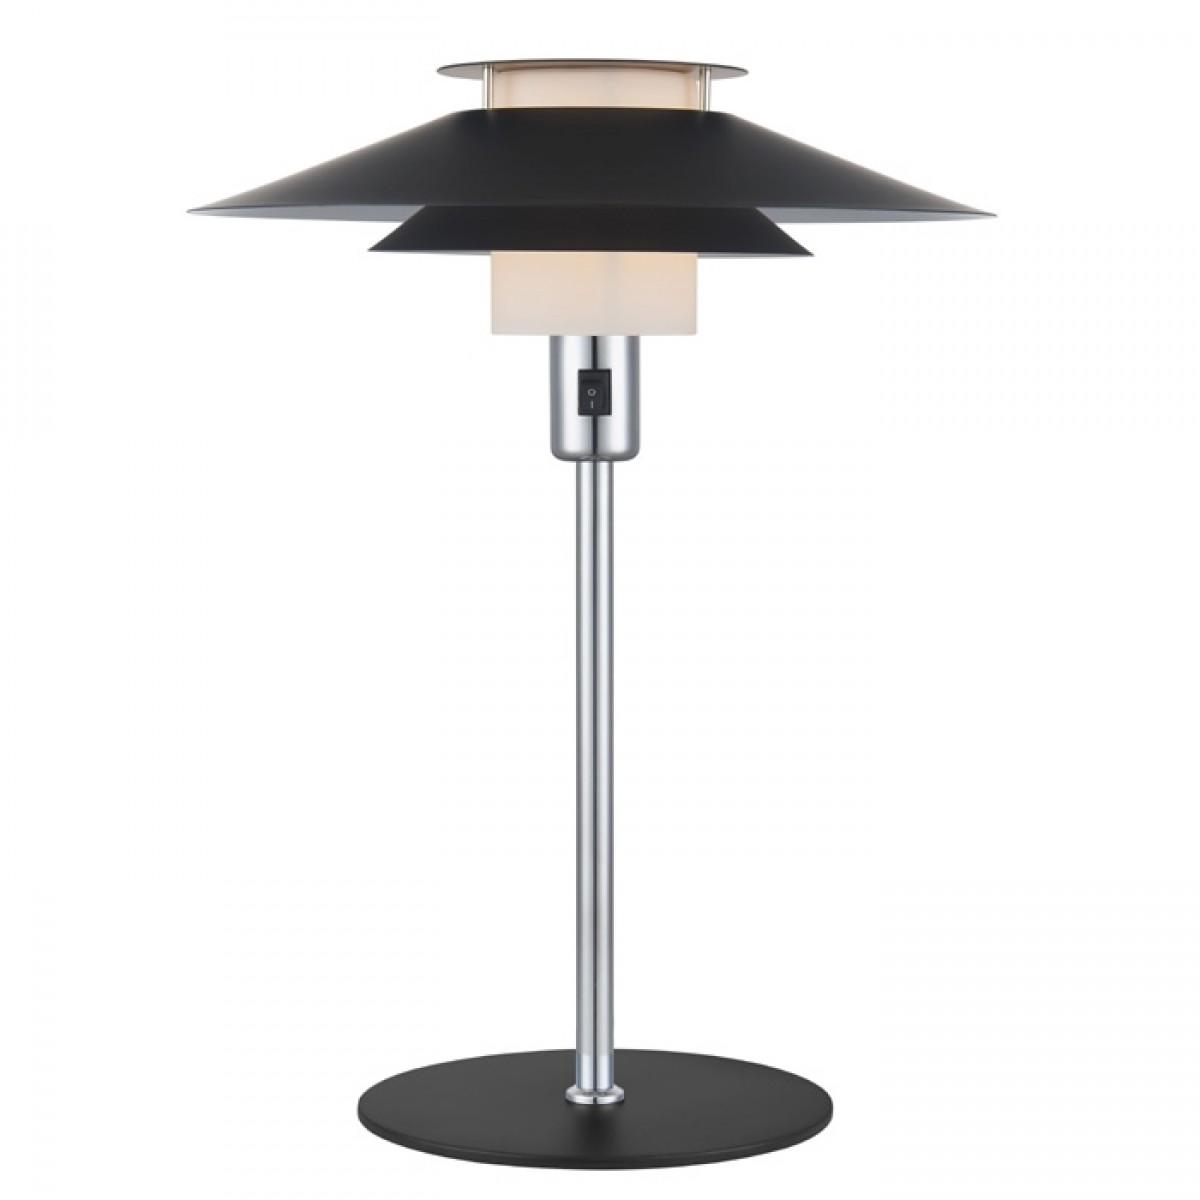 HALO DESIGN Bordlampe rivoli sort/krom ø24 cm.